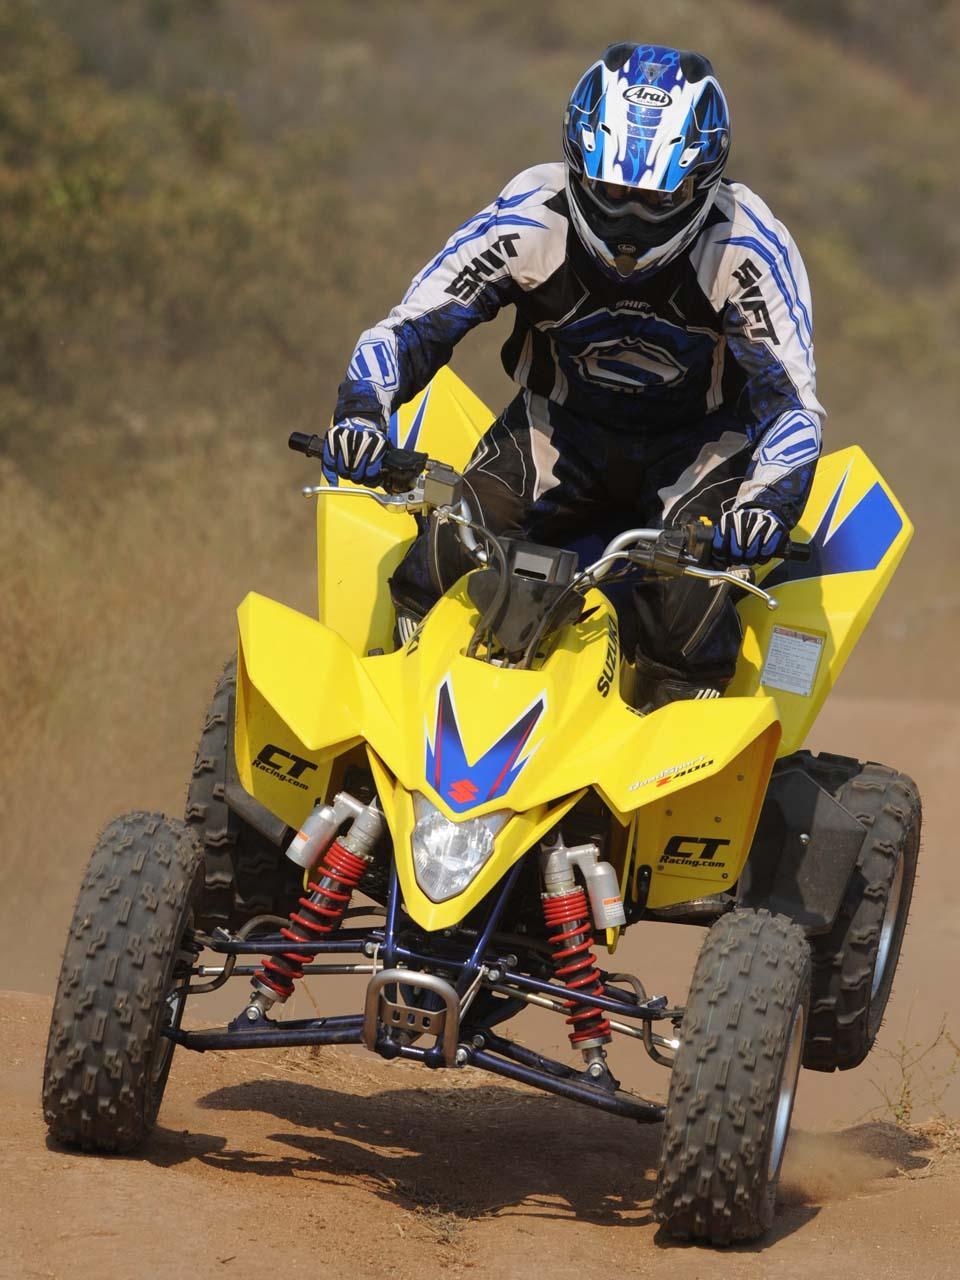 2010.suzuki.ltz400.yellow.front_.riding.on-sand_0.